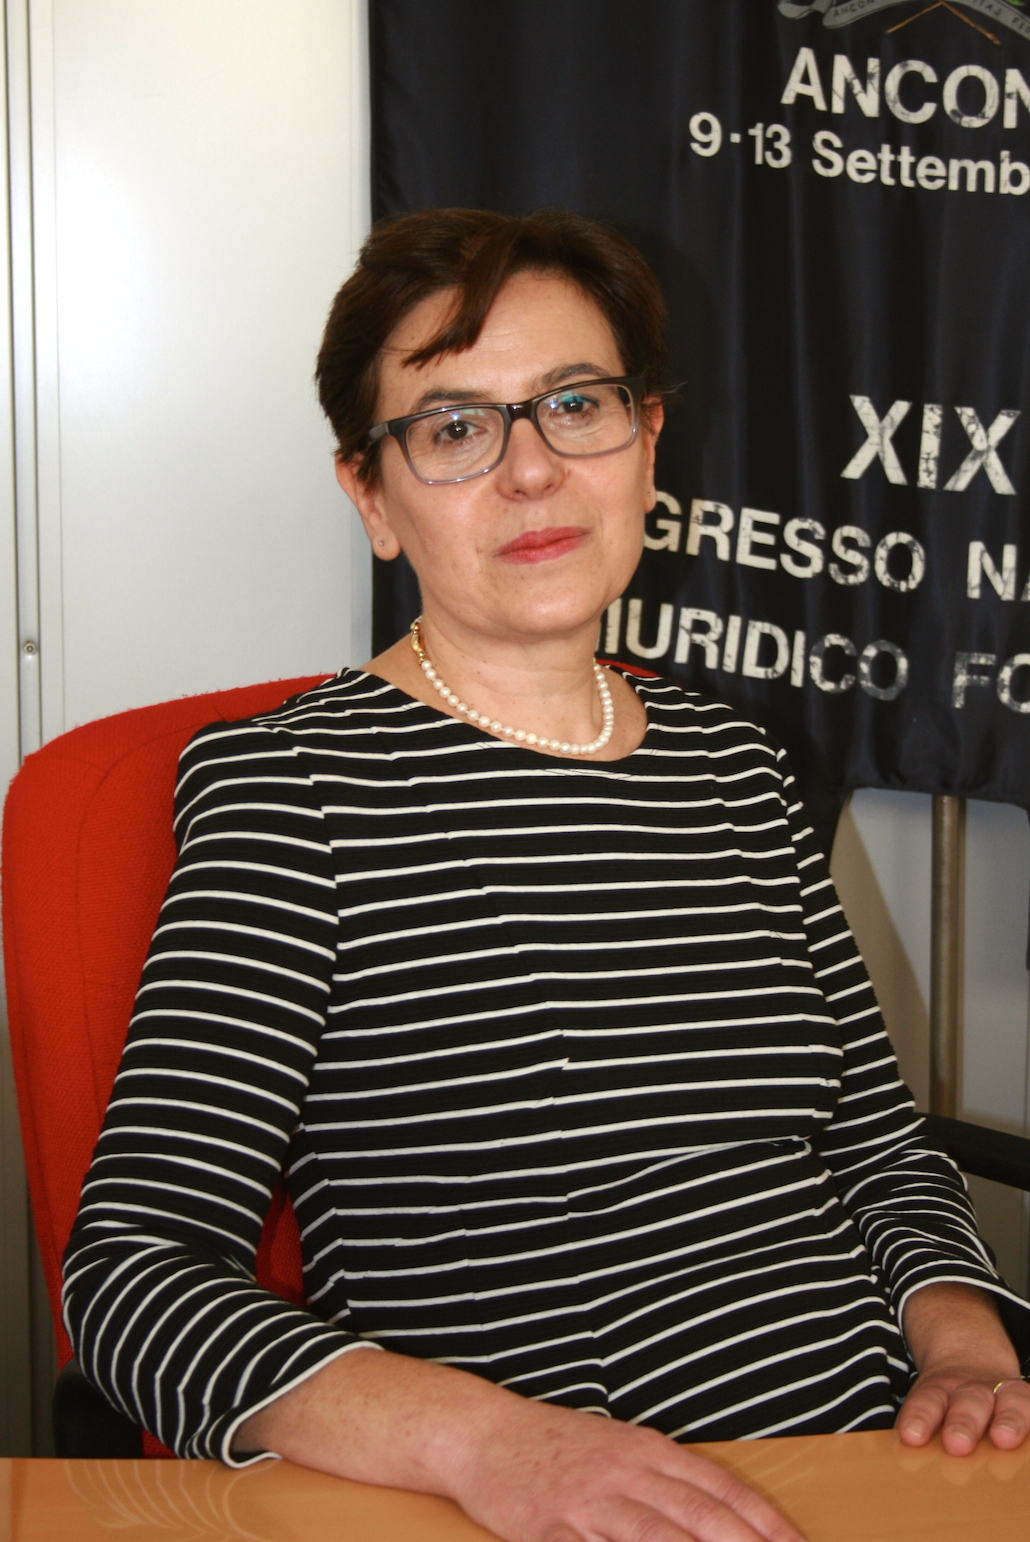 La Legge professionale forense: se ne parla mercoledì ad Ancona